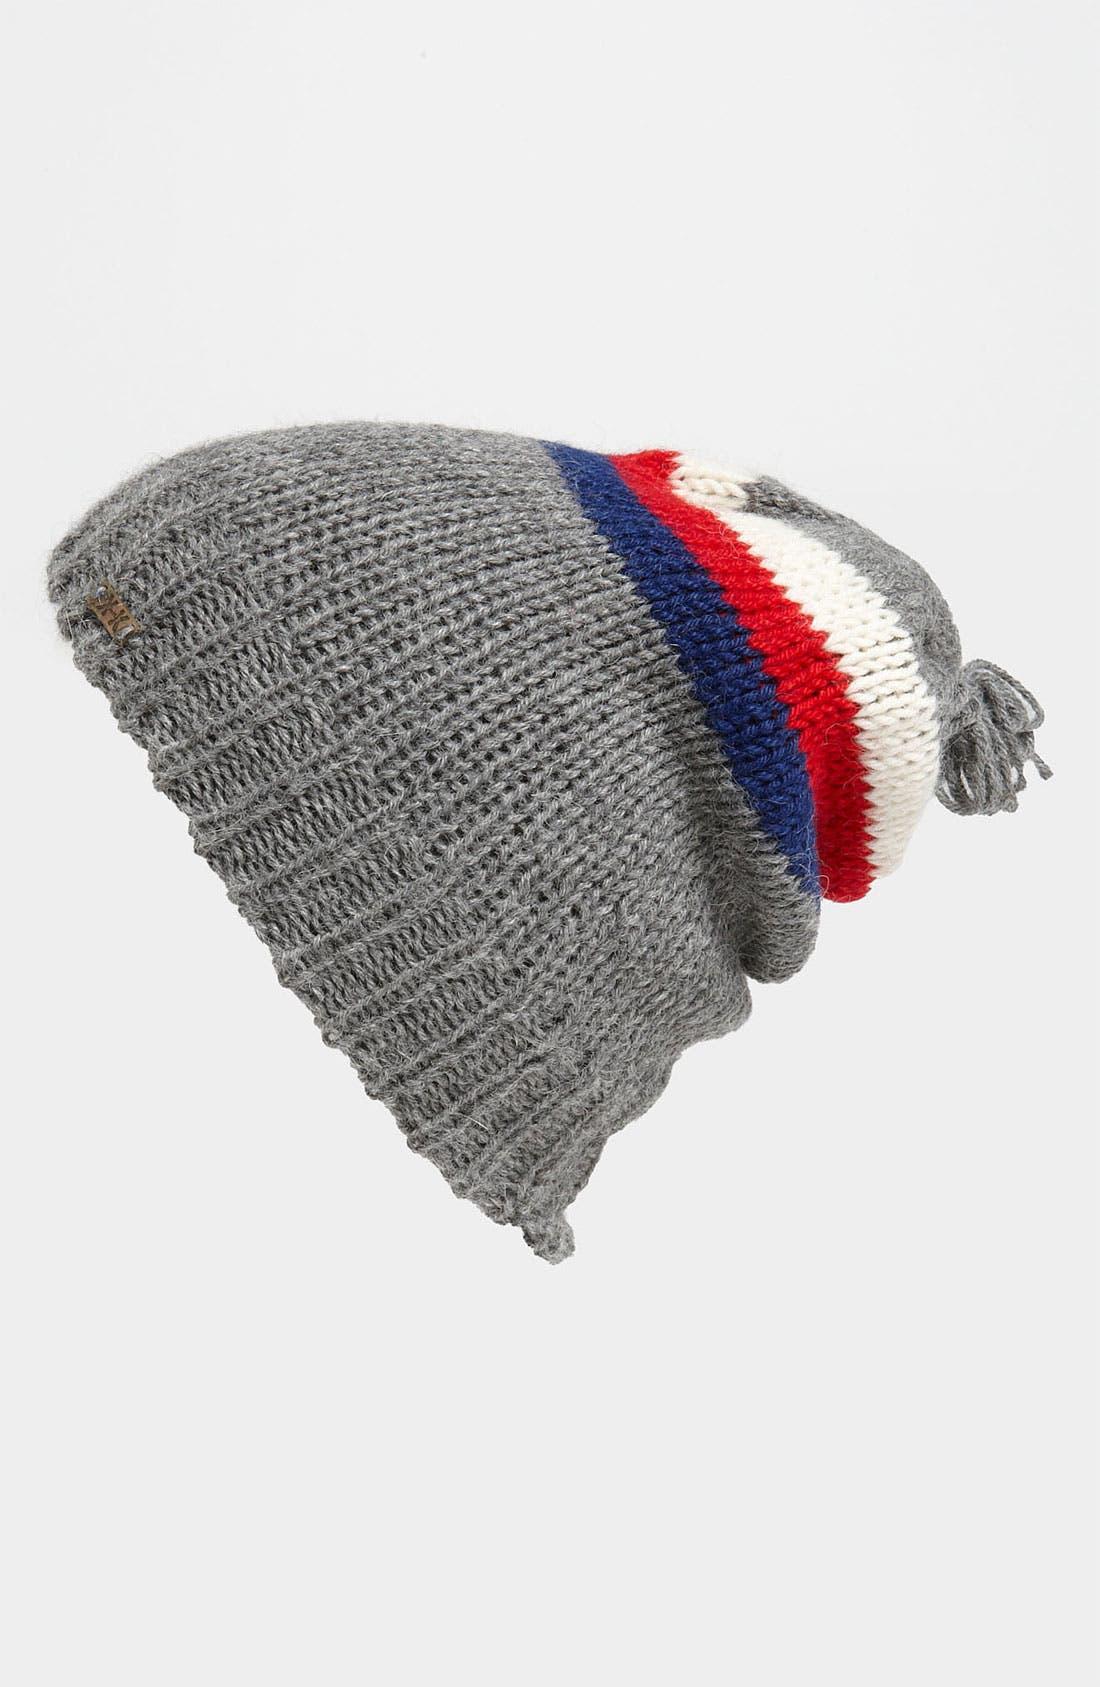 Alternate Image 1 Selected - Krochet Kids 'Tandem' Knit Cap